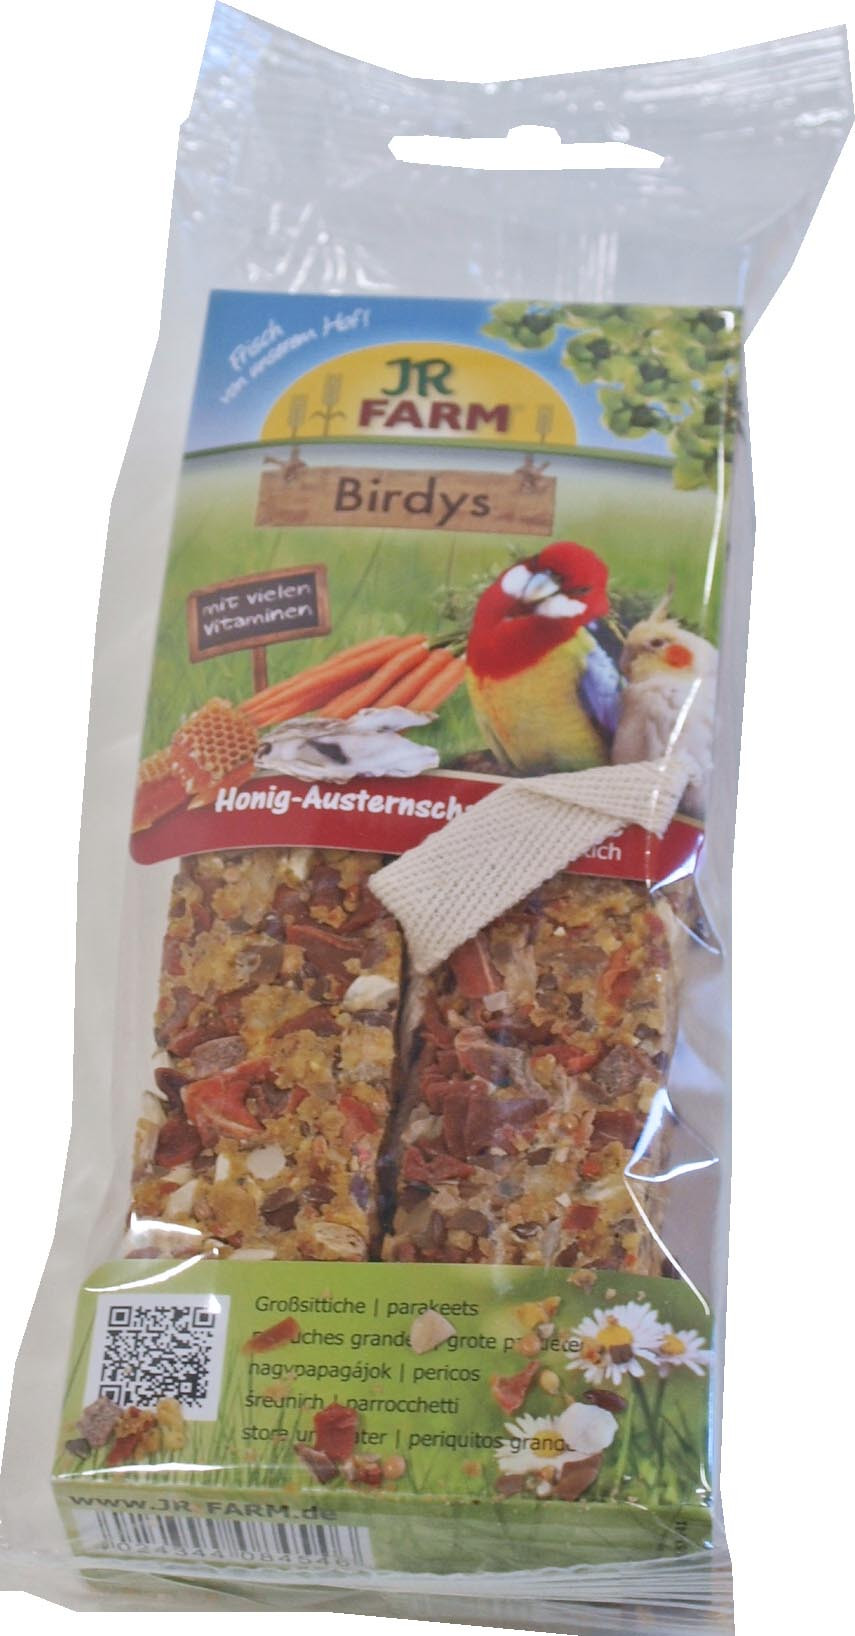 JR Farm Birdy agapornis honing/ oesterschel/wortel 260 gr